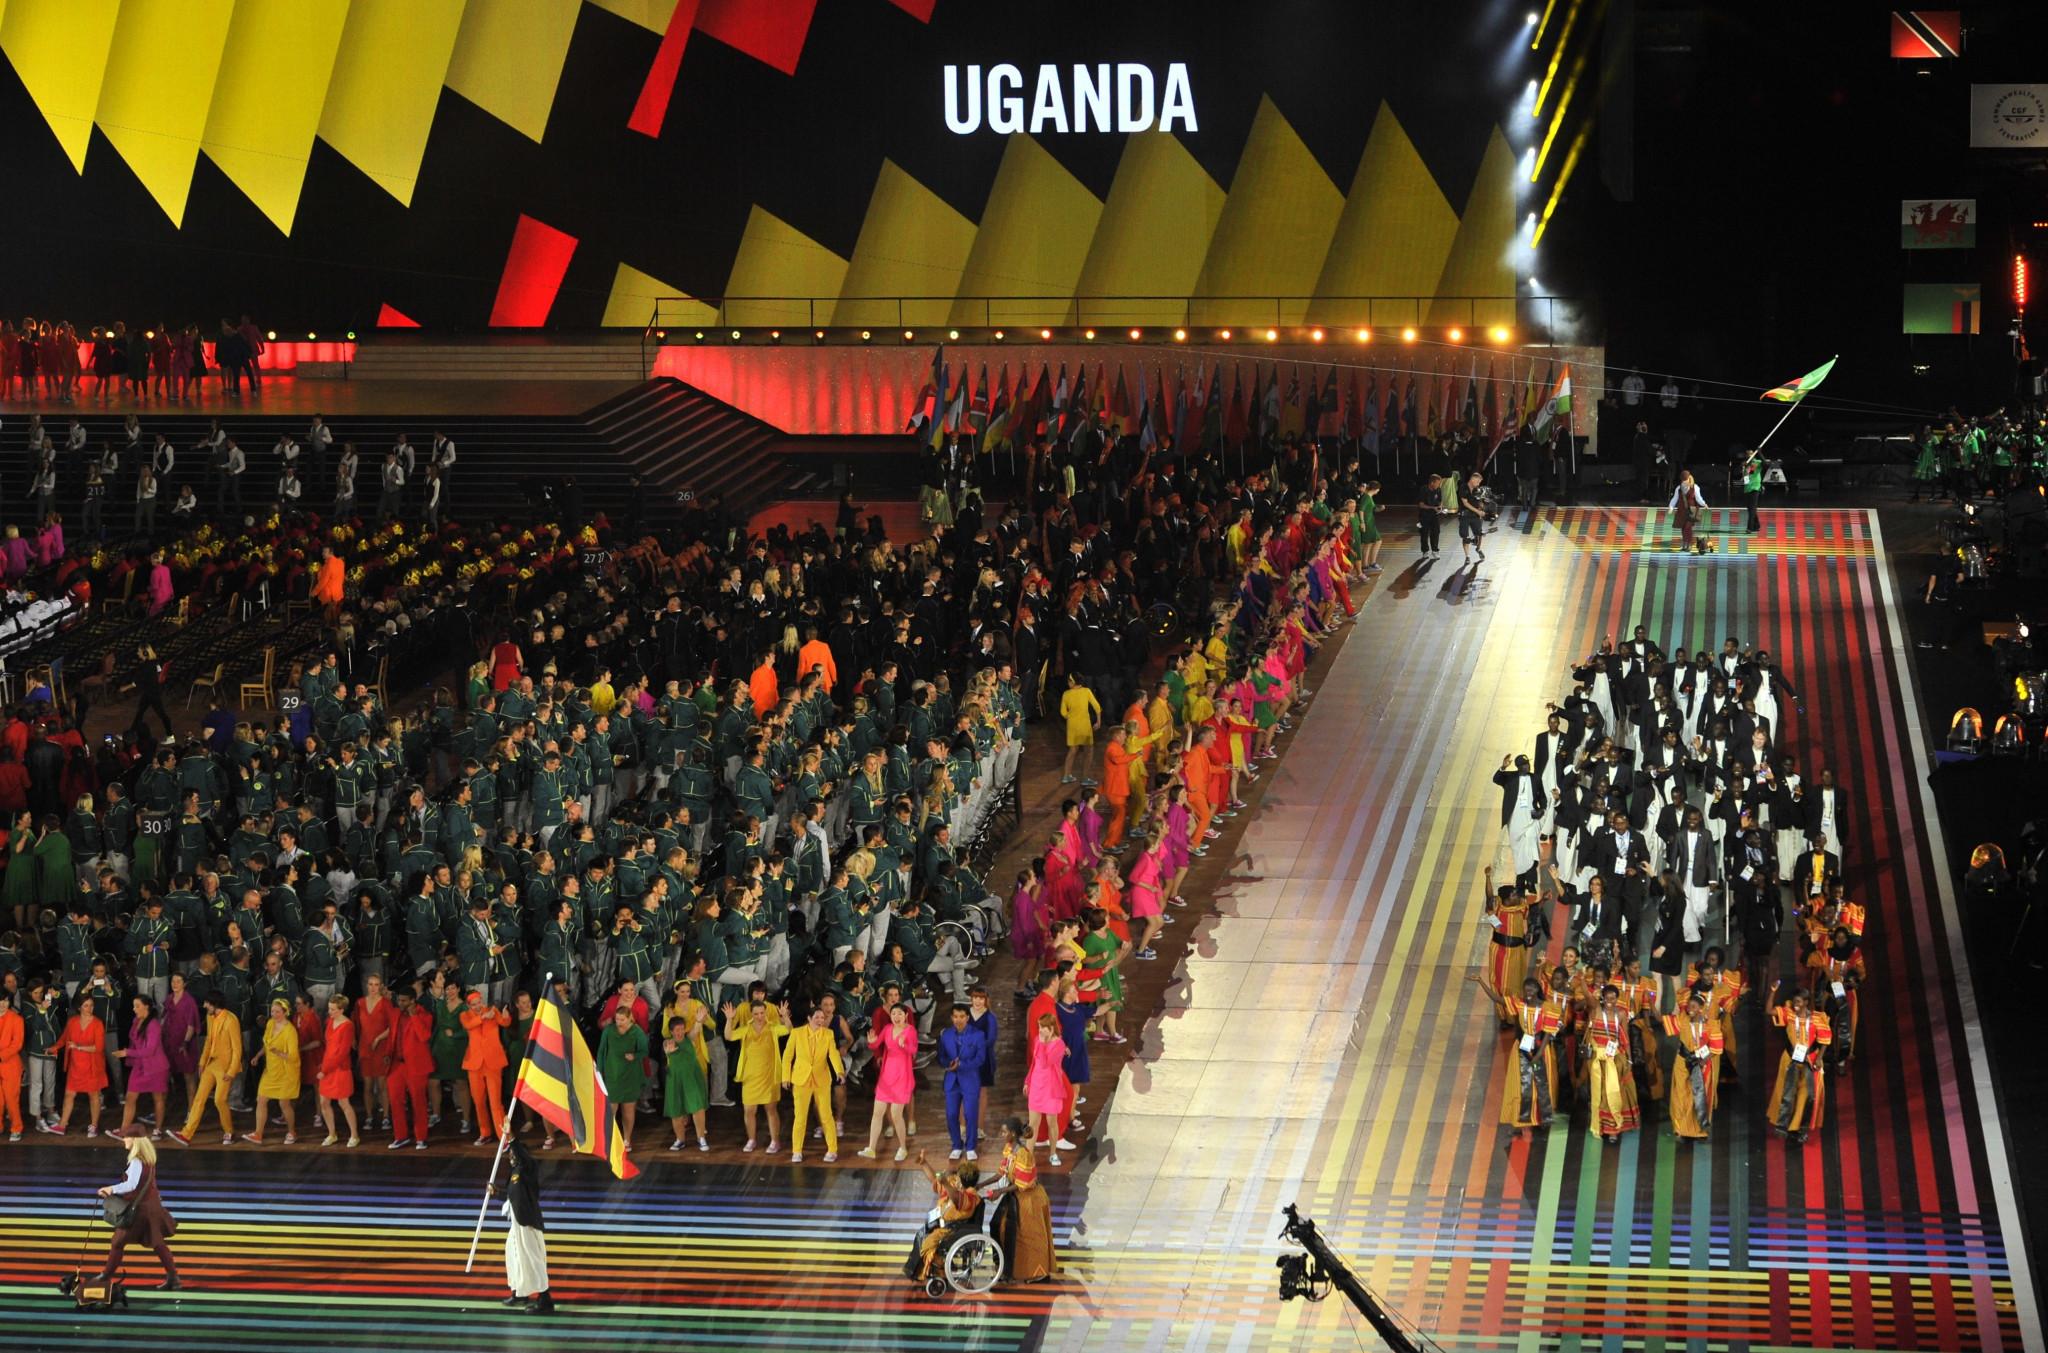 Ugandan athletes to undergo pregnancy tests before selection for Gold Coast 2018